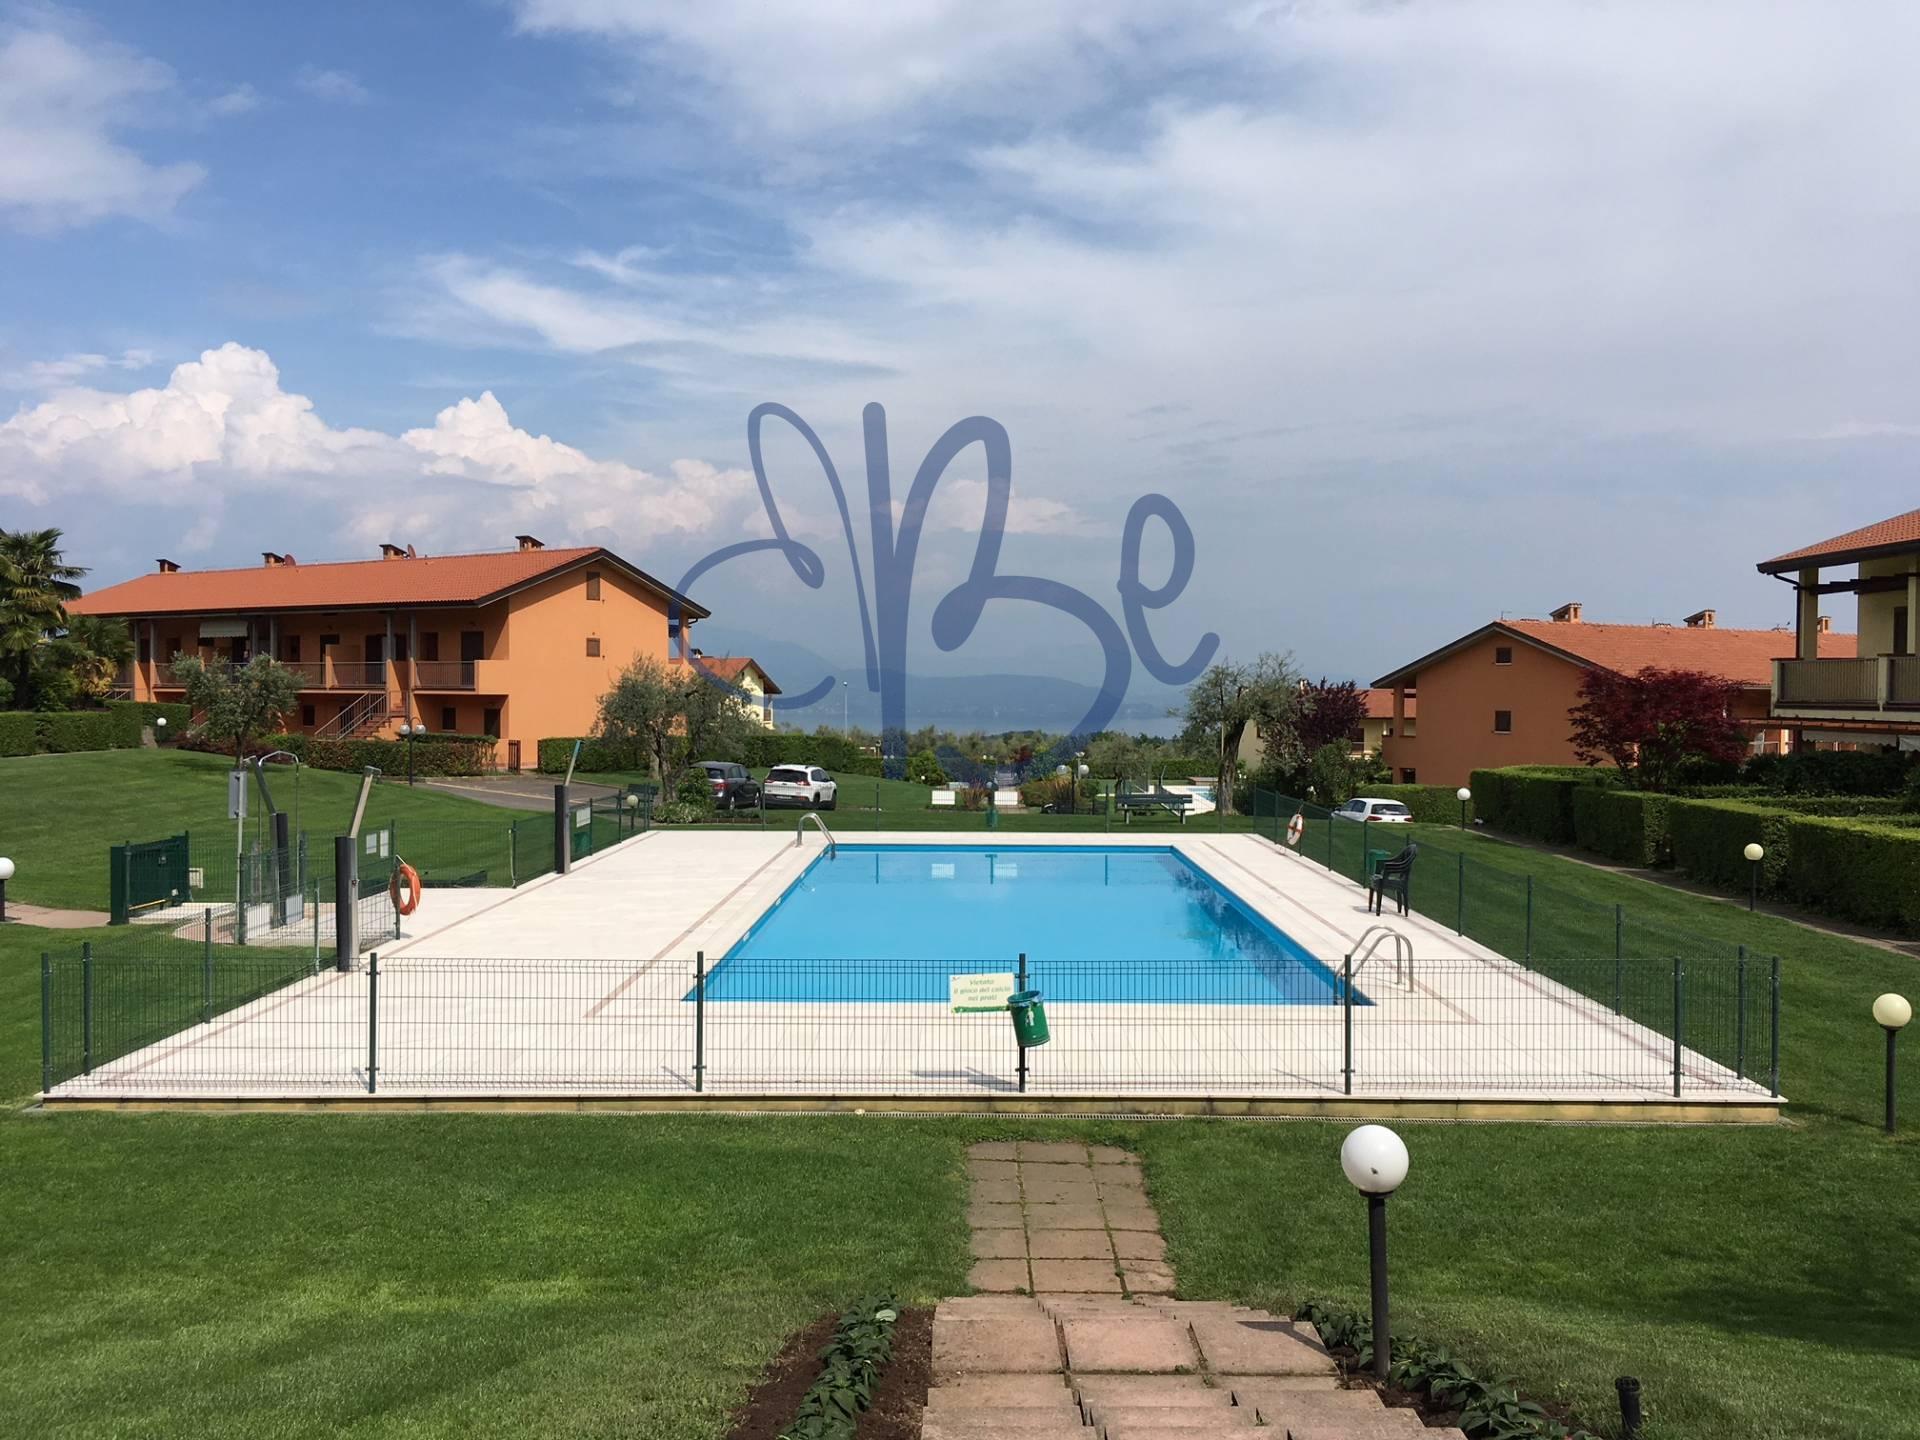 APPARTAMENTO in Affitto a Puegnago Del Garda (BRESCIA)